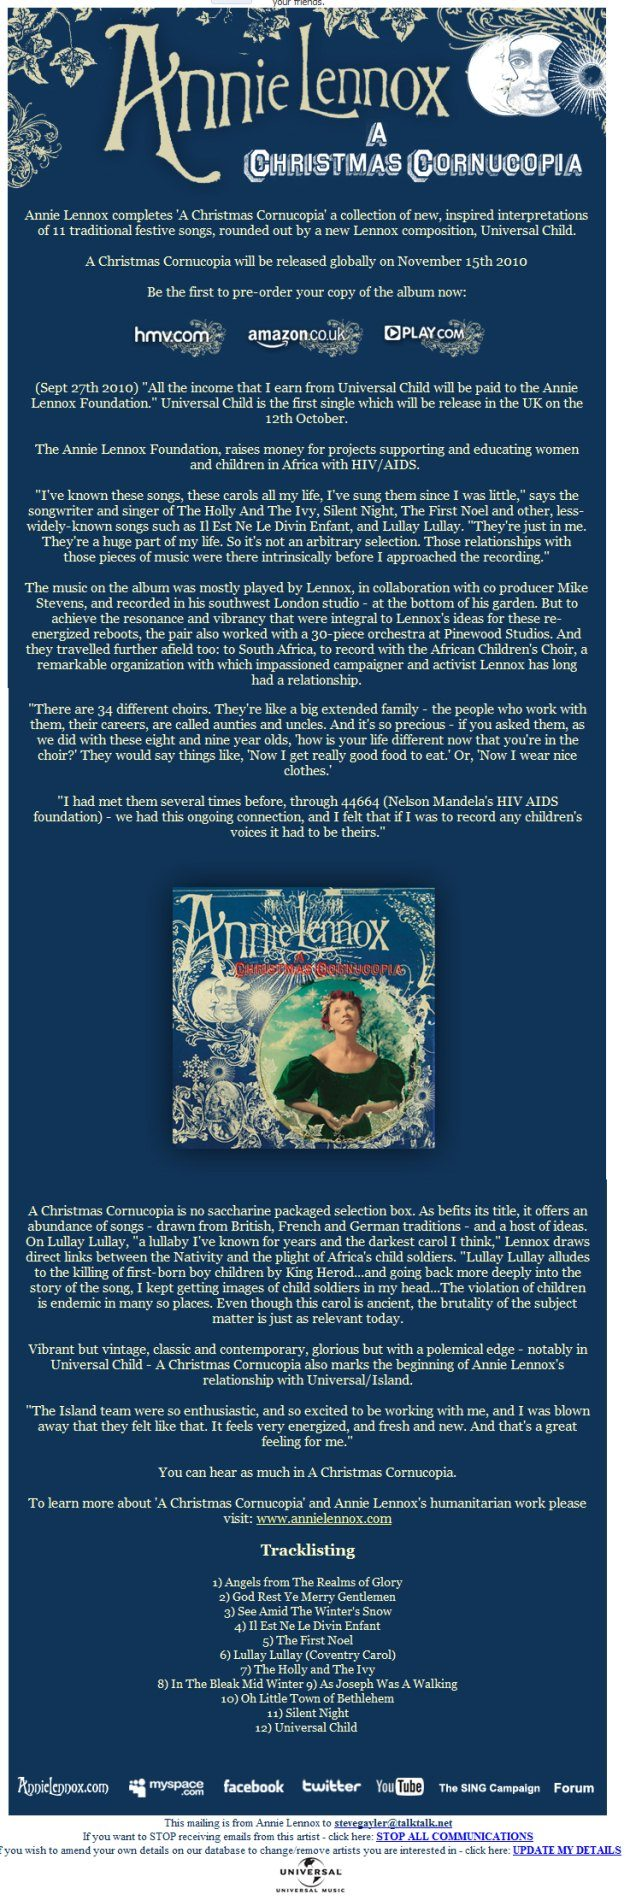 Annie Lennox – A Christmas Cornucopia Announcement From Universal